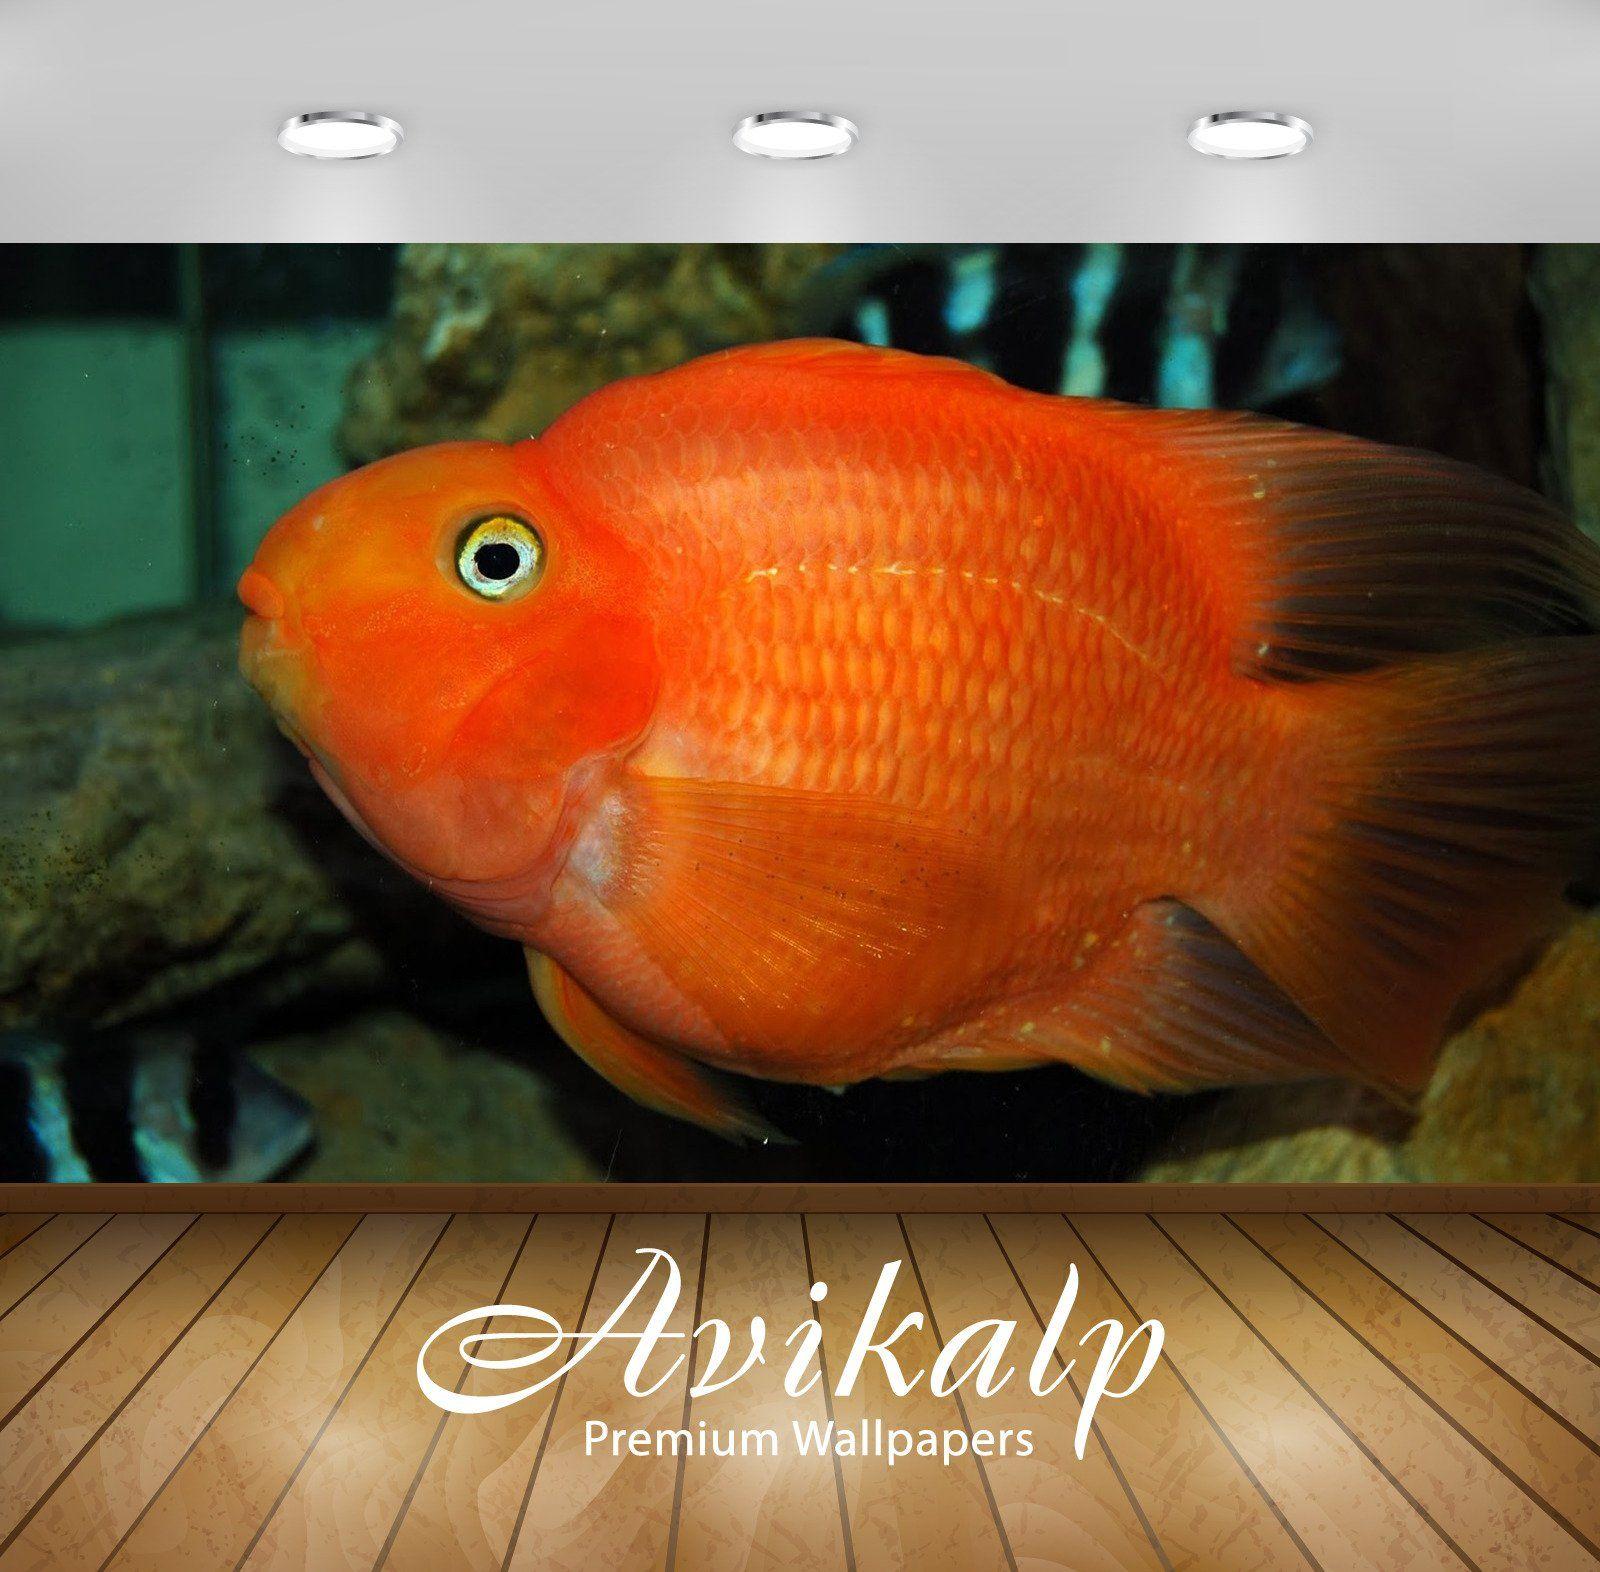 Avikalp Exclusive Awi2938 Red Ikan Parrot Fish Full Hd